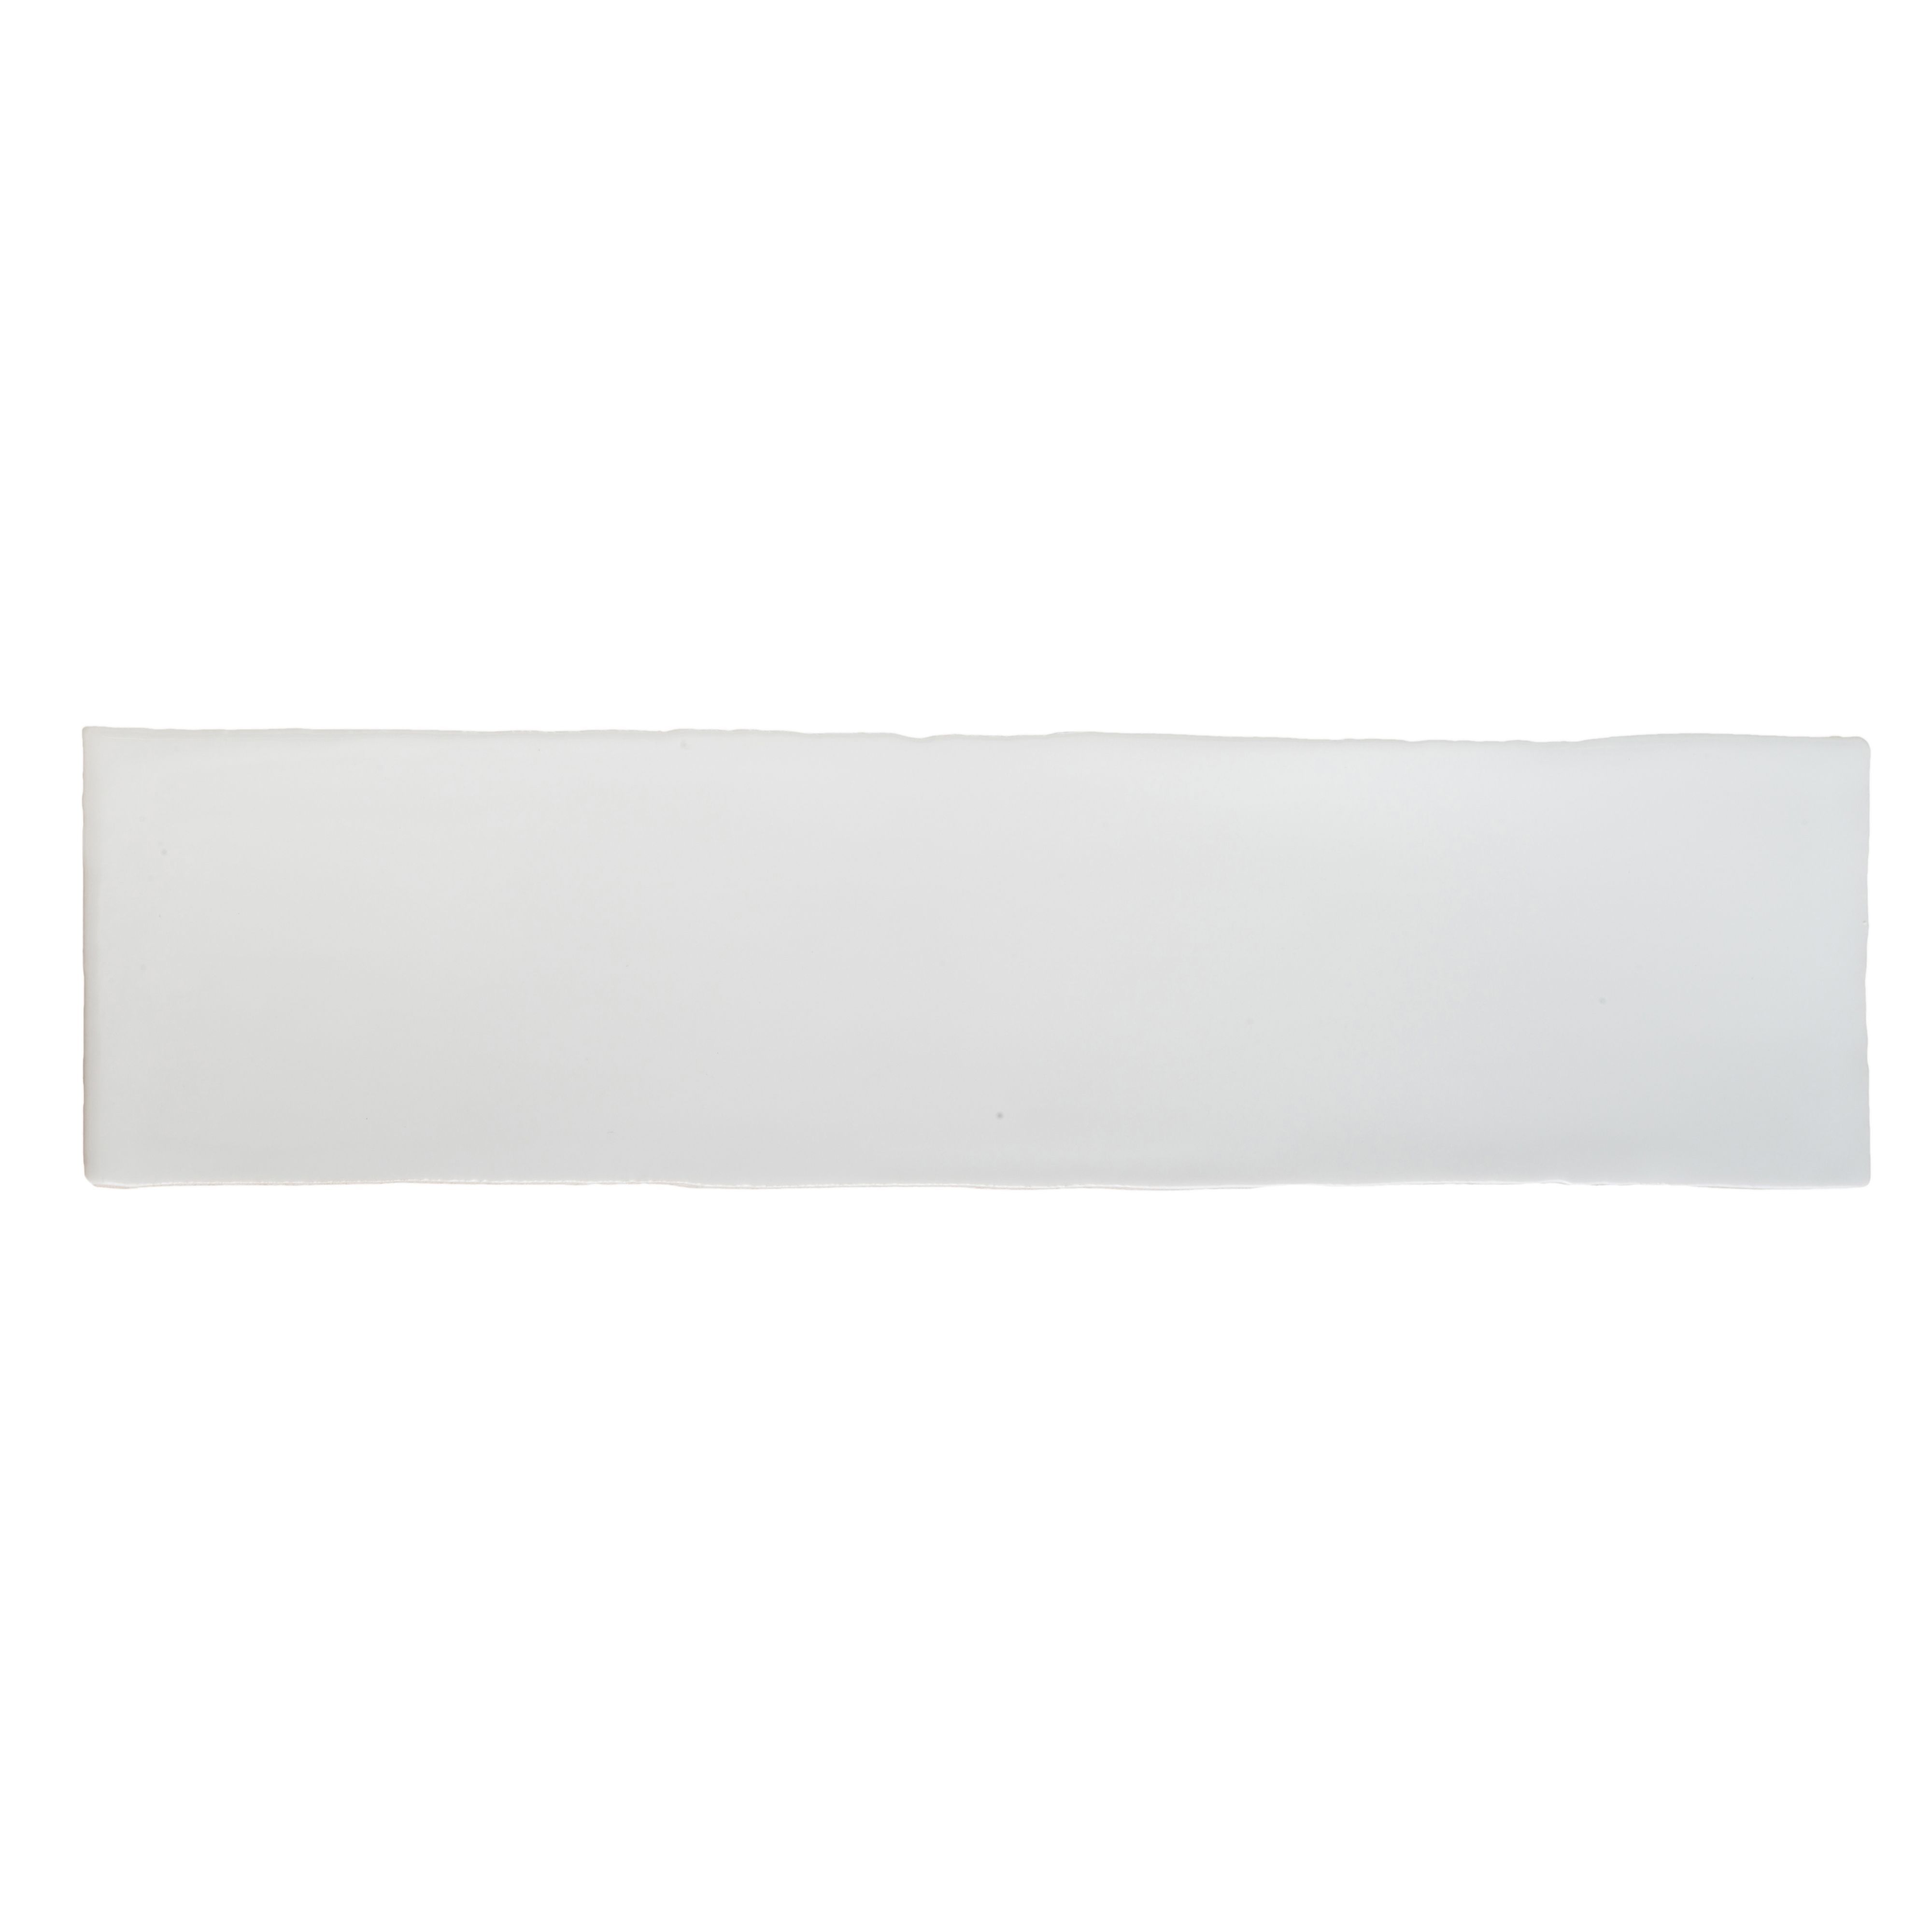 Attractive Bq Bathrooms Tiles Crest - Bathroom Design Ideas - tykkk.info